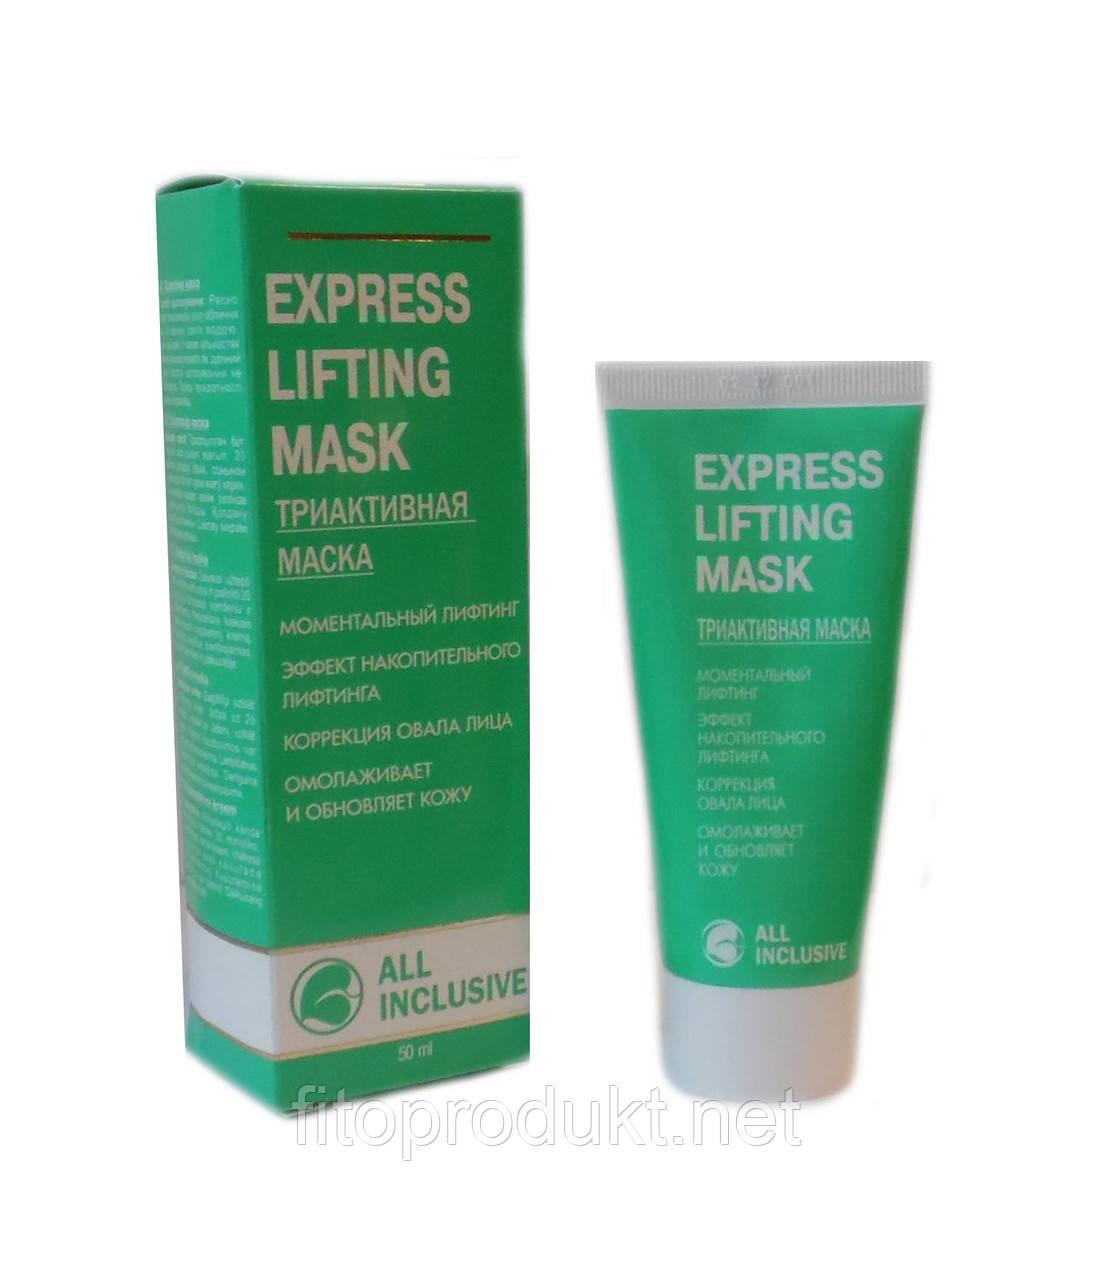 All Inclusive Маска для лица триактивная Express LIFTING Mask, 50мл